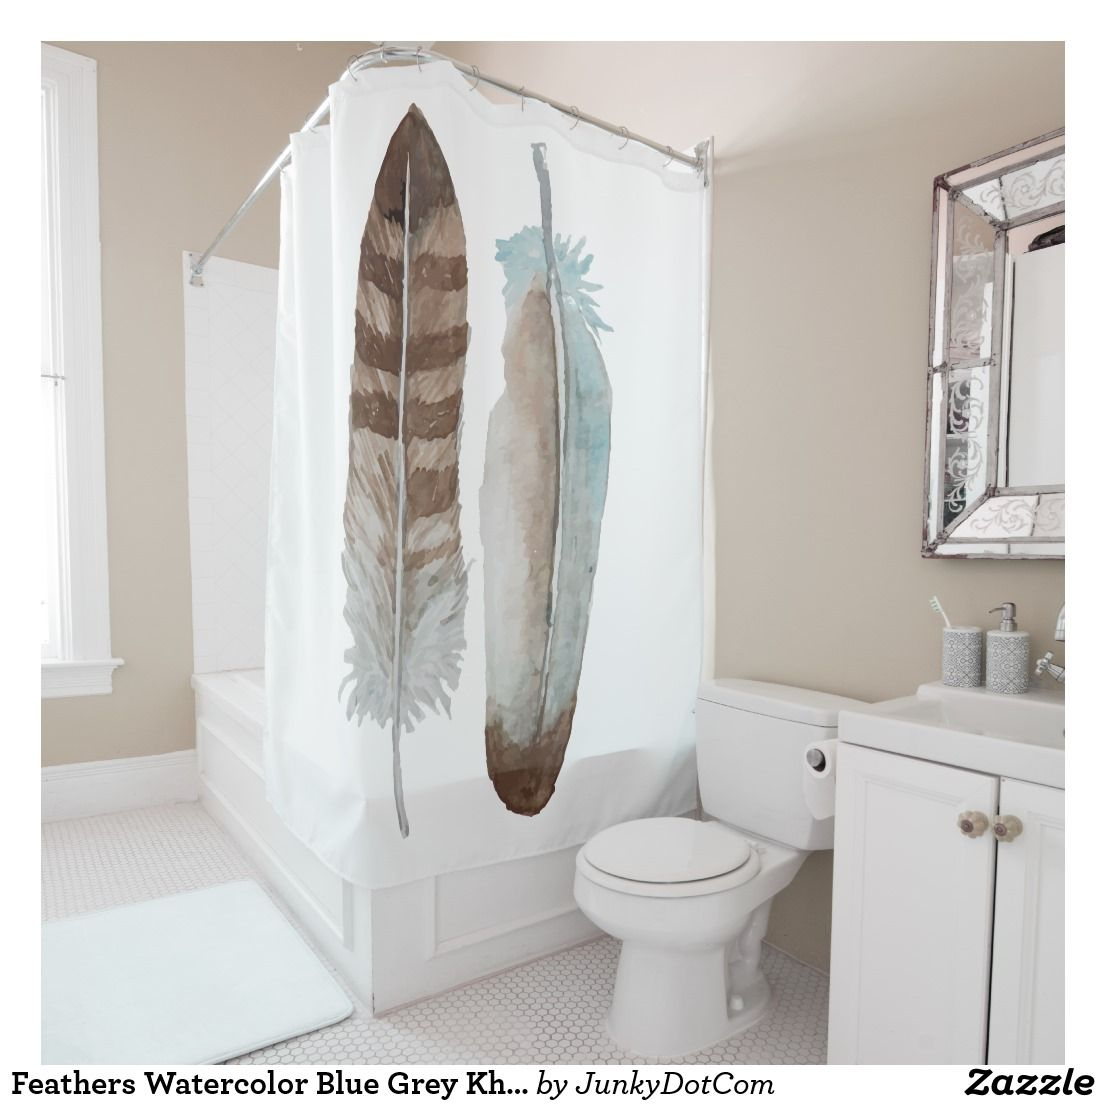 Feathers Watercolor Blue Grey Khaki Pastel Shower Curtain Zazzle